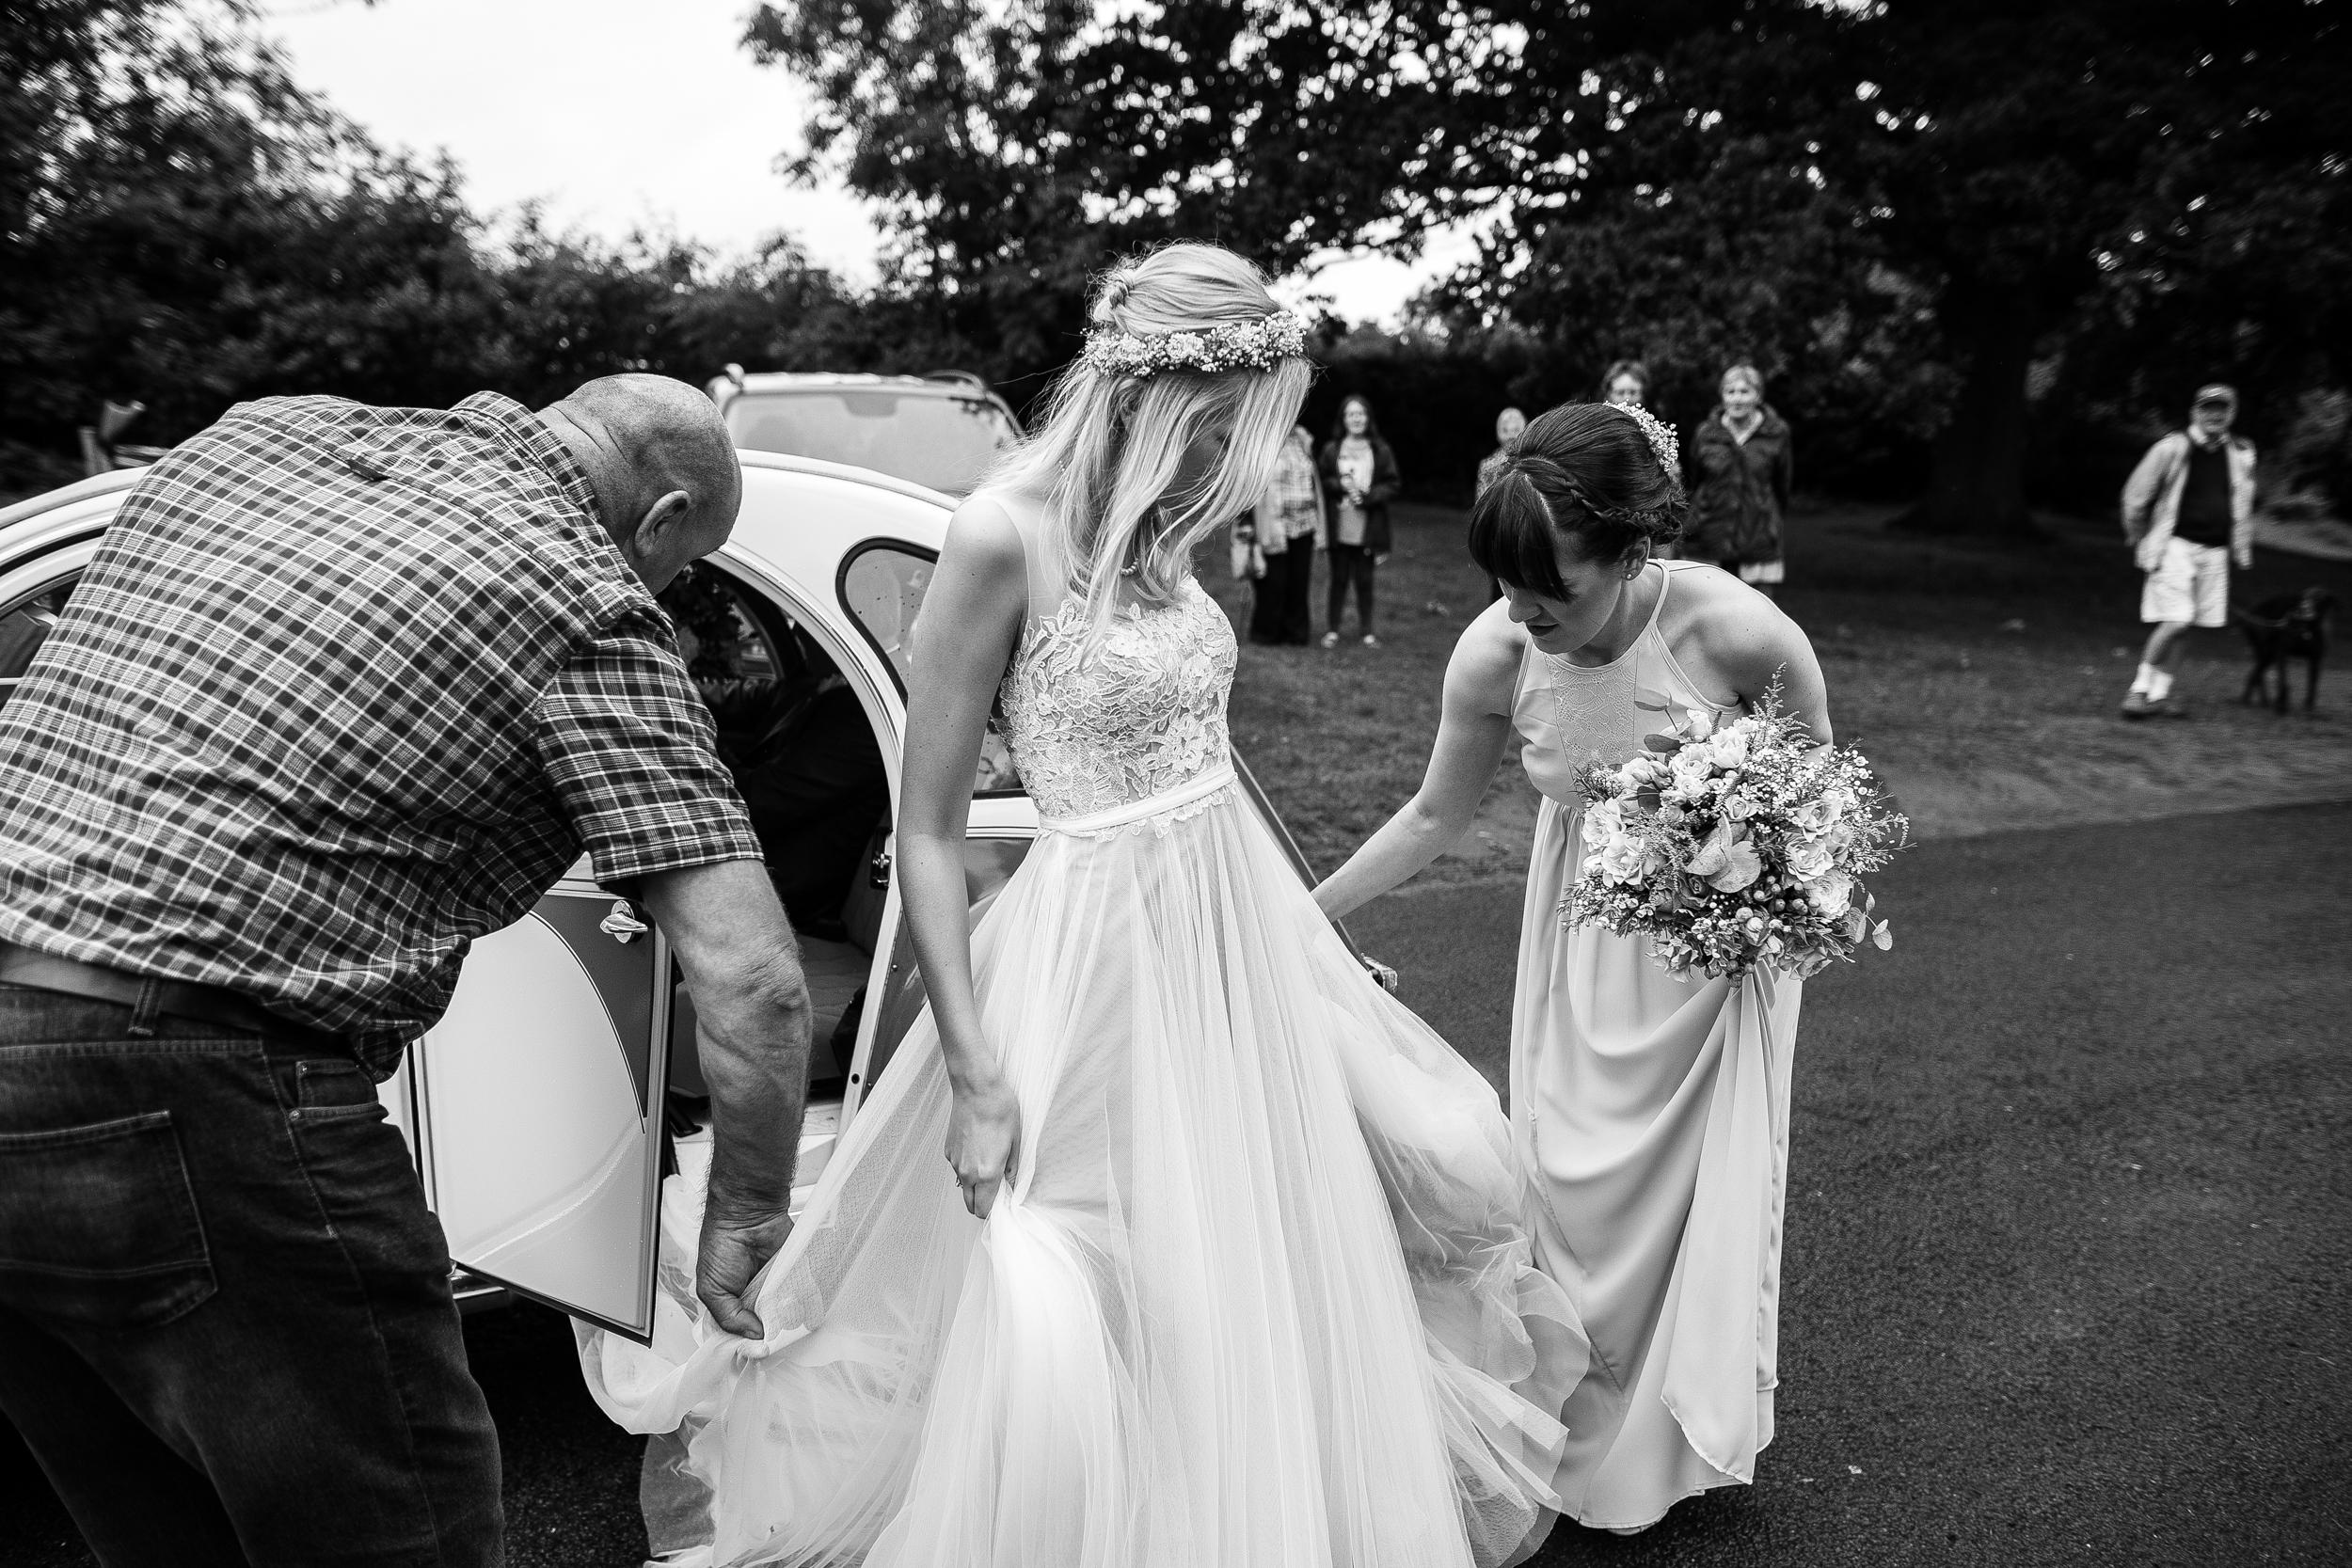 creative-wedding-photography-teesside-north-east-yorkshire-29.jpg